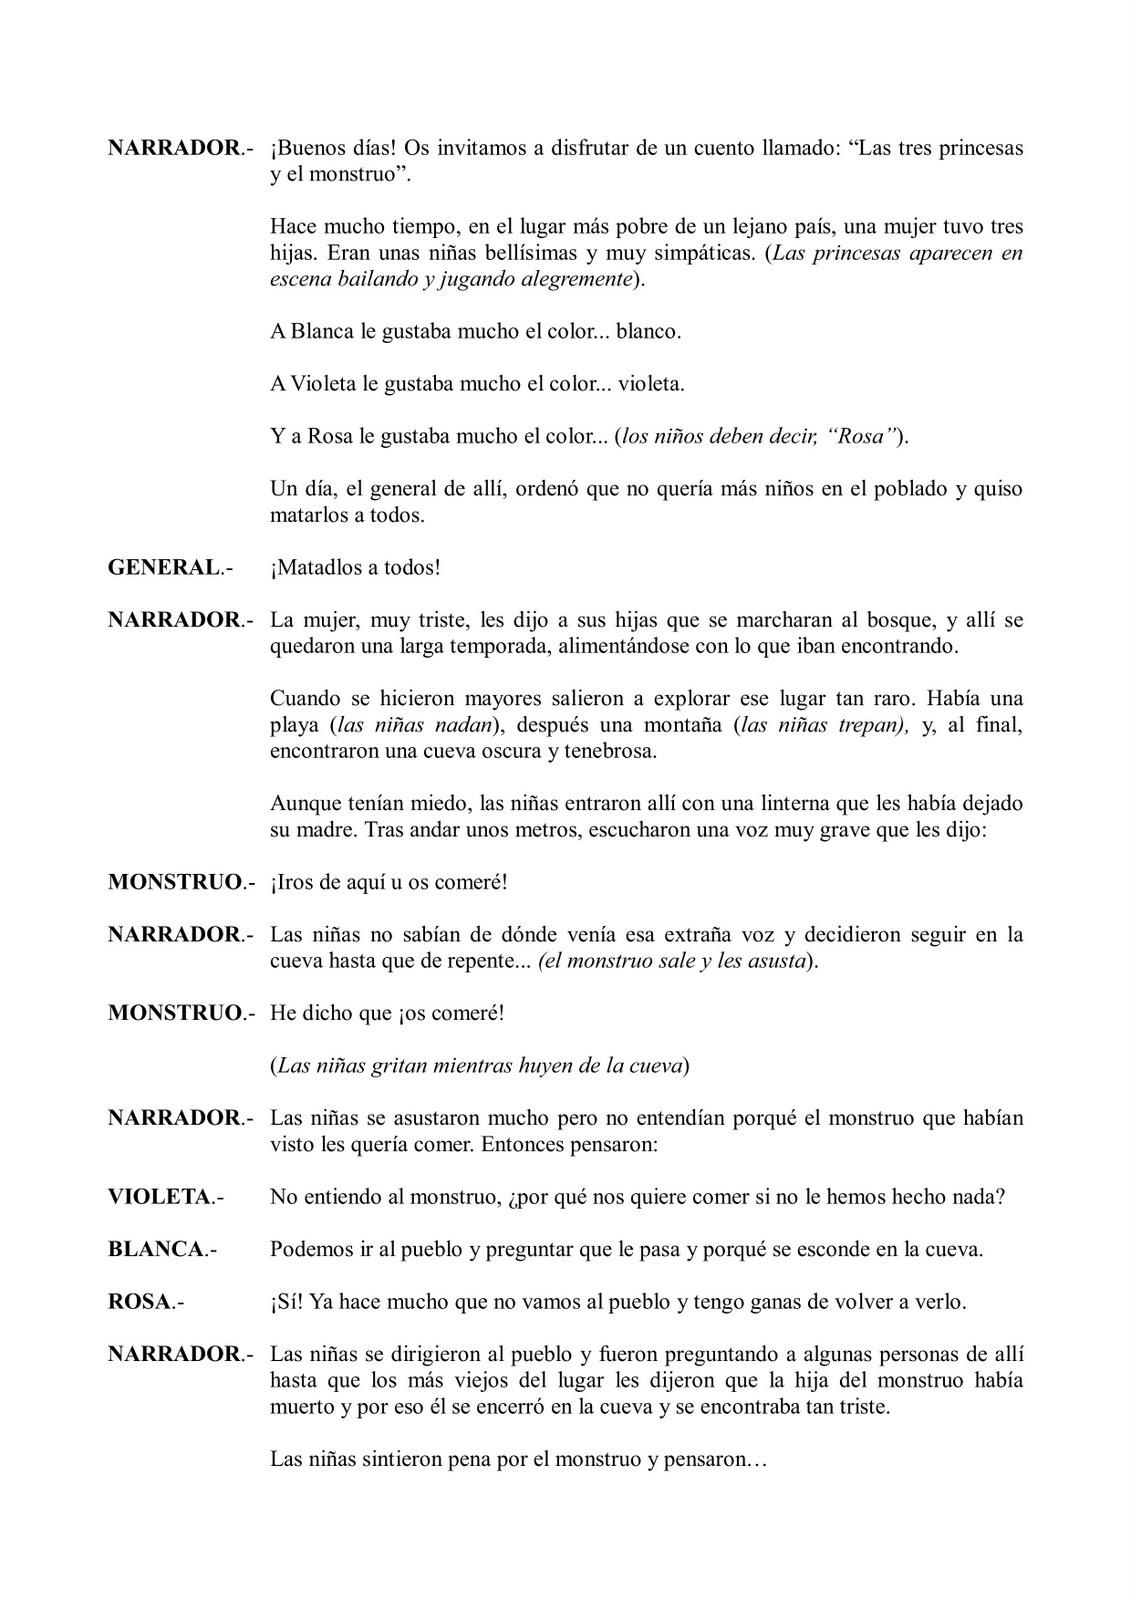 Tercero de Primaria - C.E.I.P. Monteolivo: Teatro de la clase